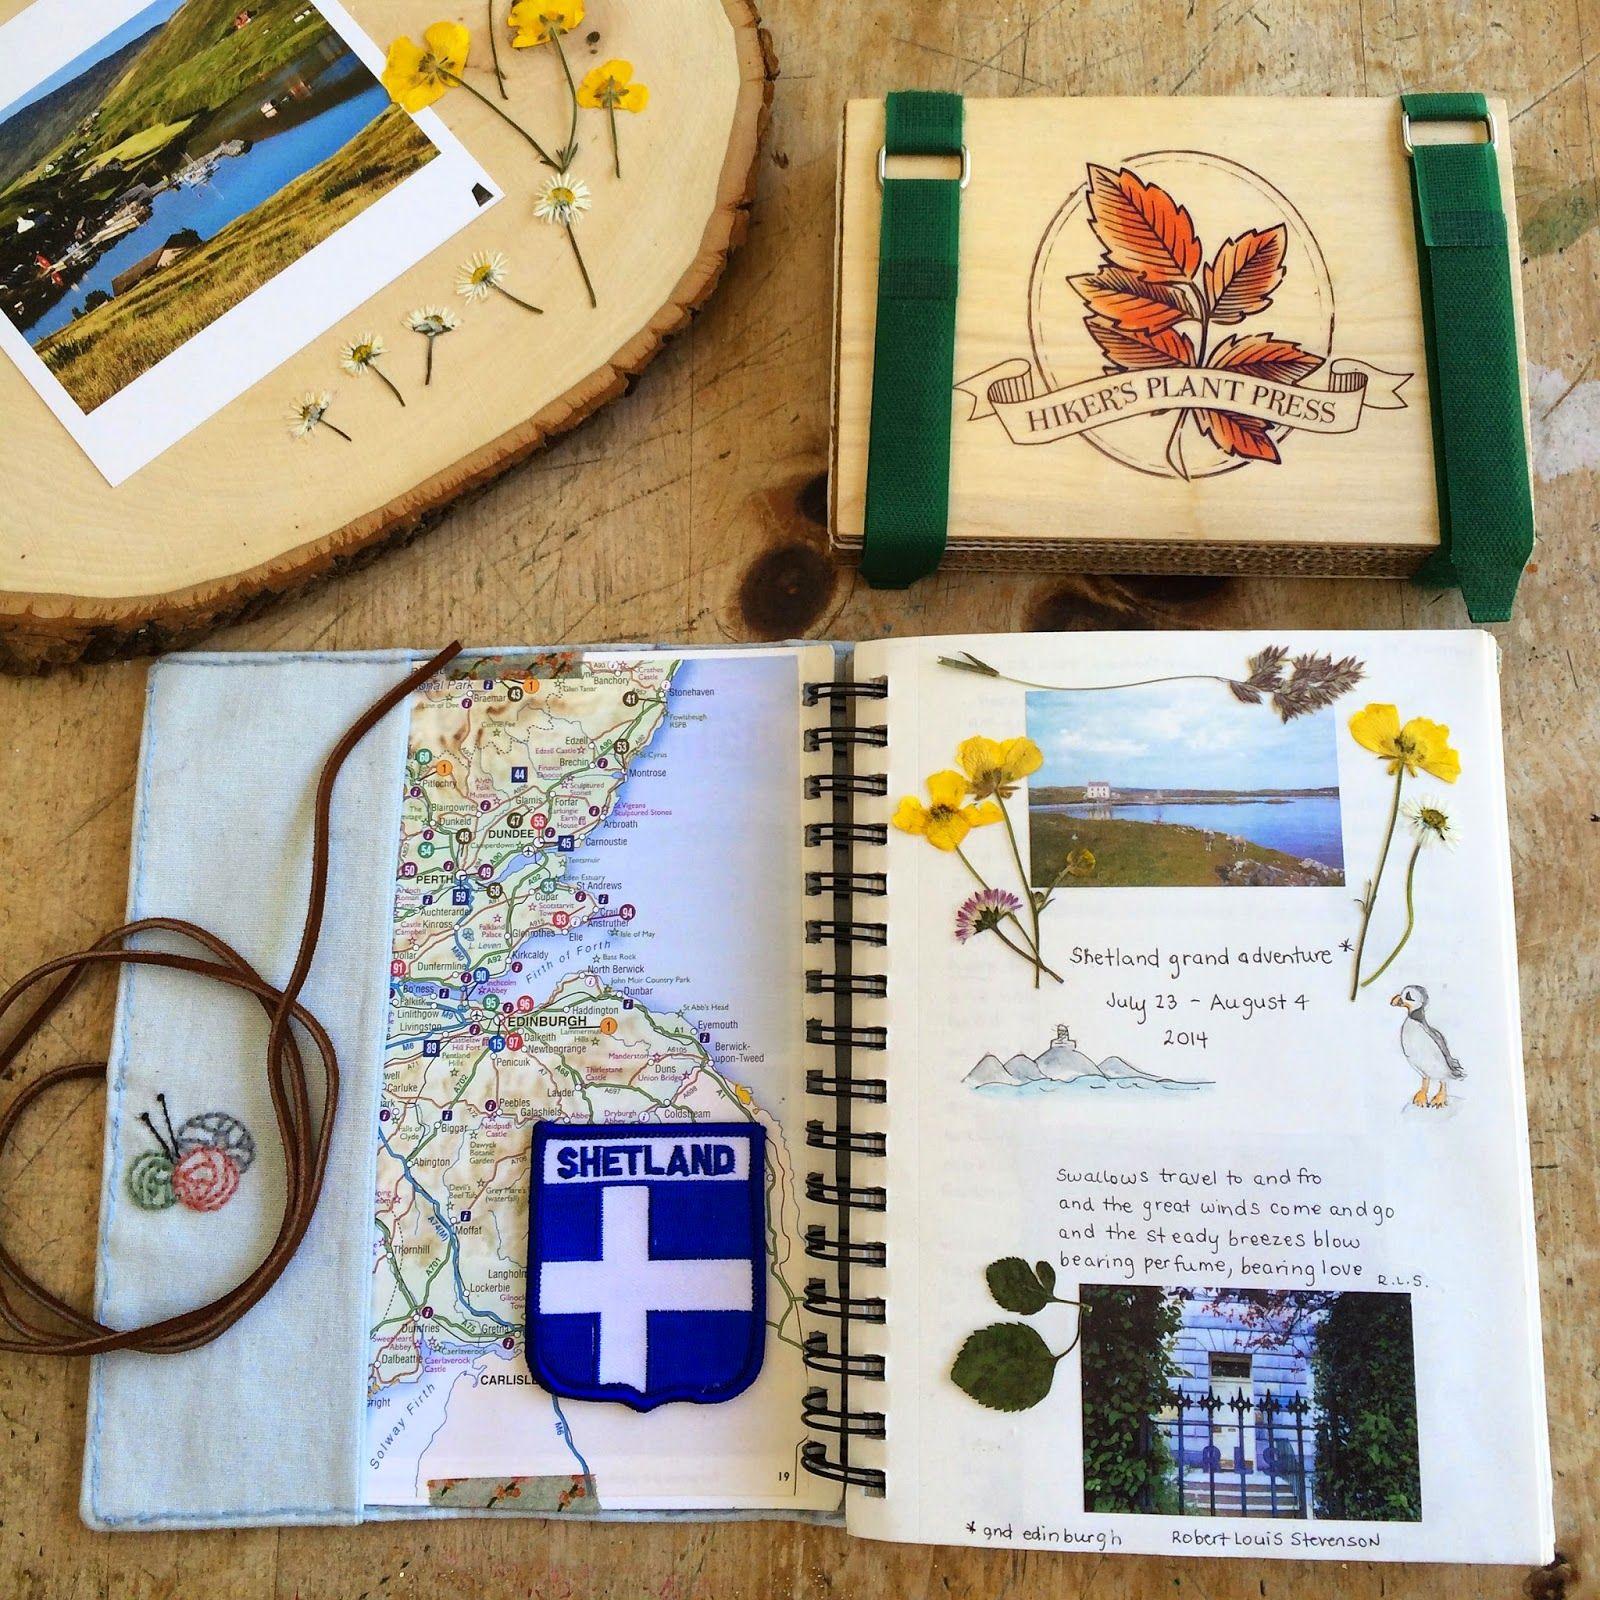 lori times five Hiker's Plant Press - Nature's Pressed